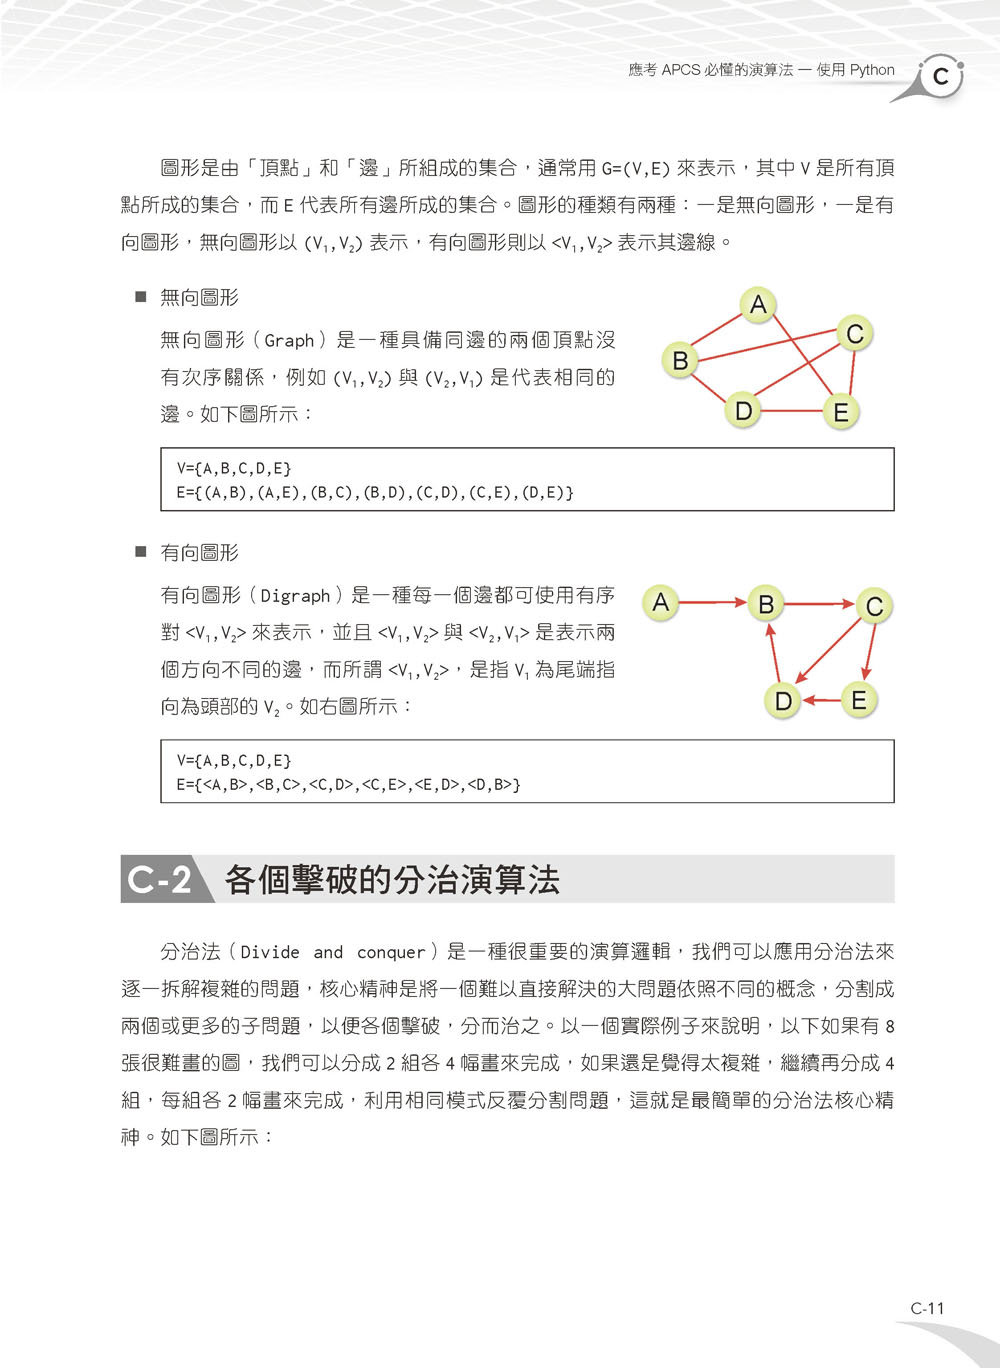 APCS 大學程式設計先修檢測:Python 超效解題致勝祕笈-preview-11